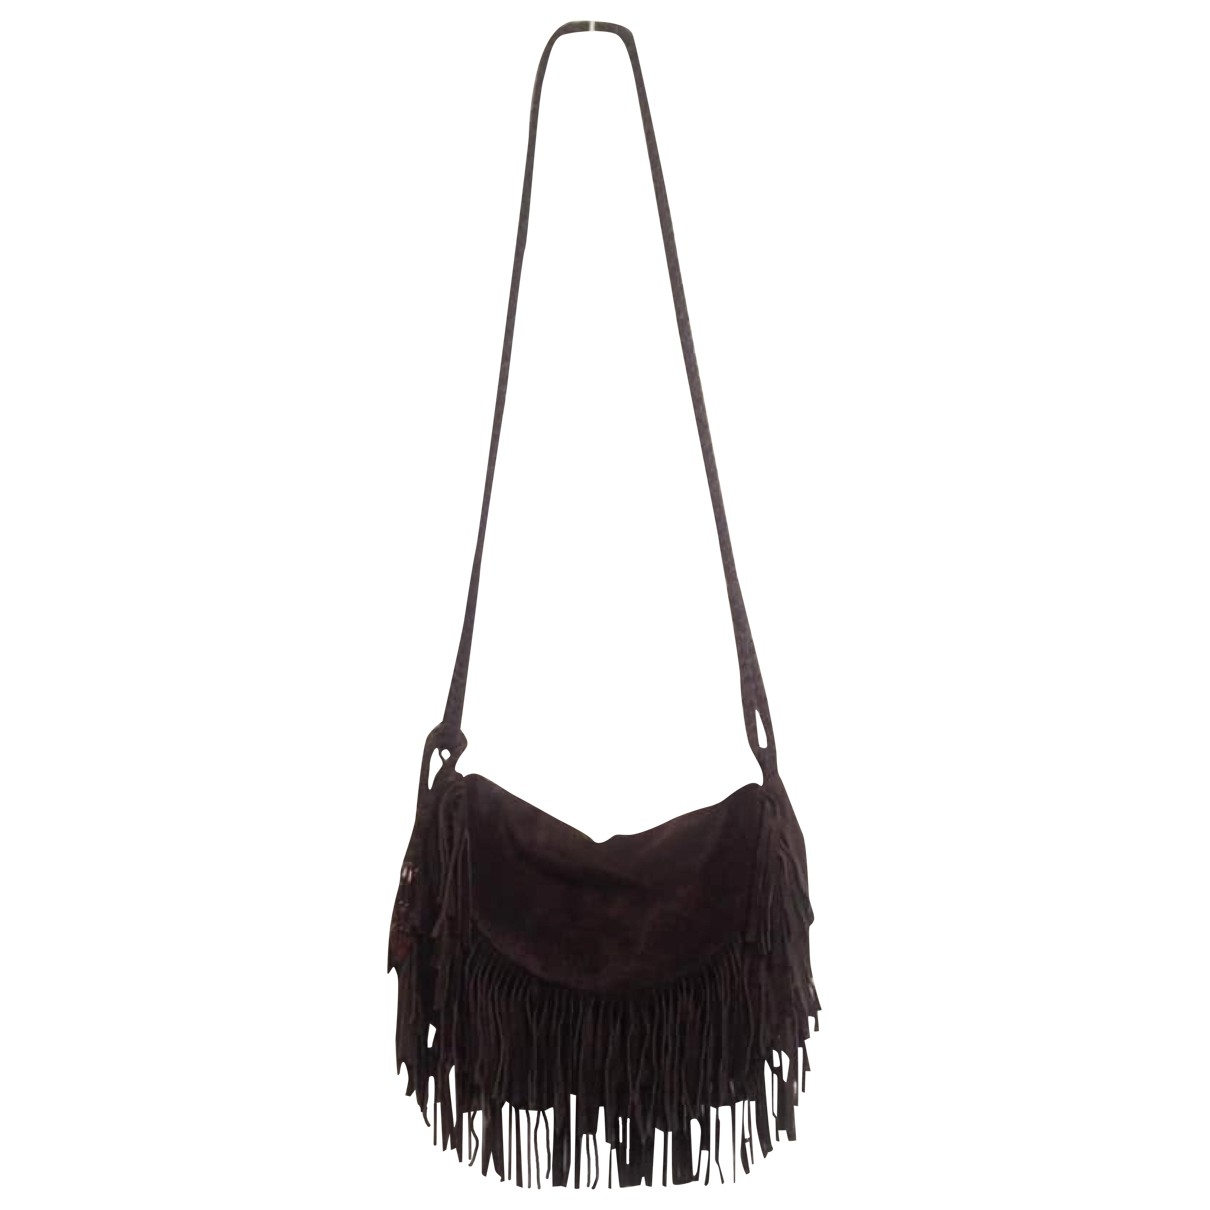 Antik Batik \N Brown Suede handbag for Women \N